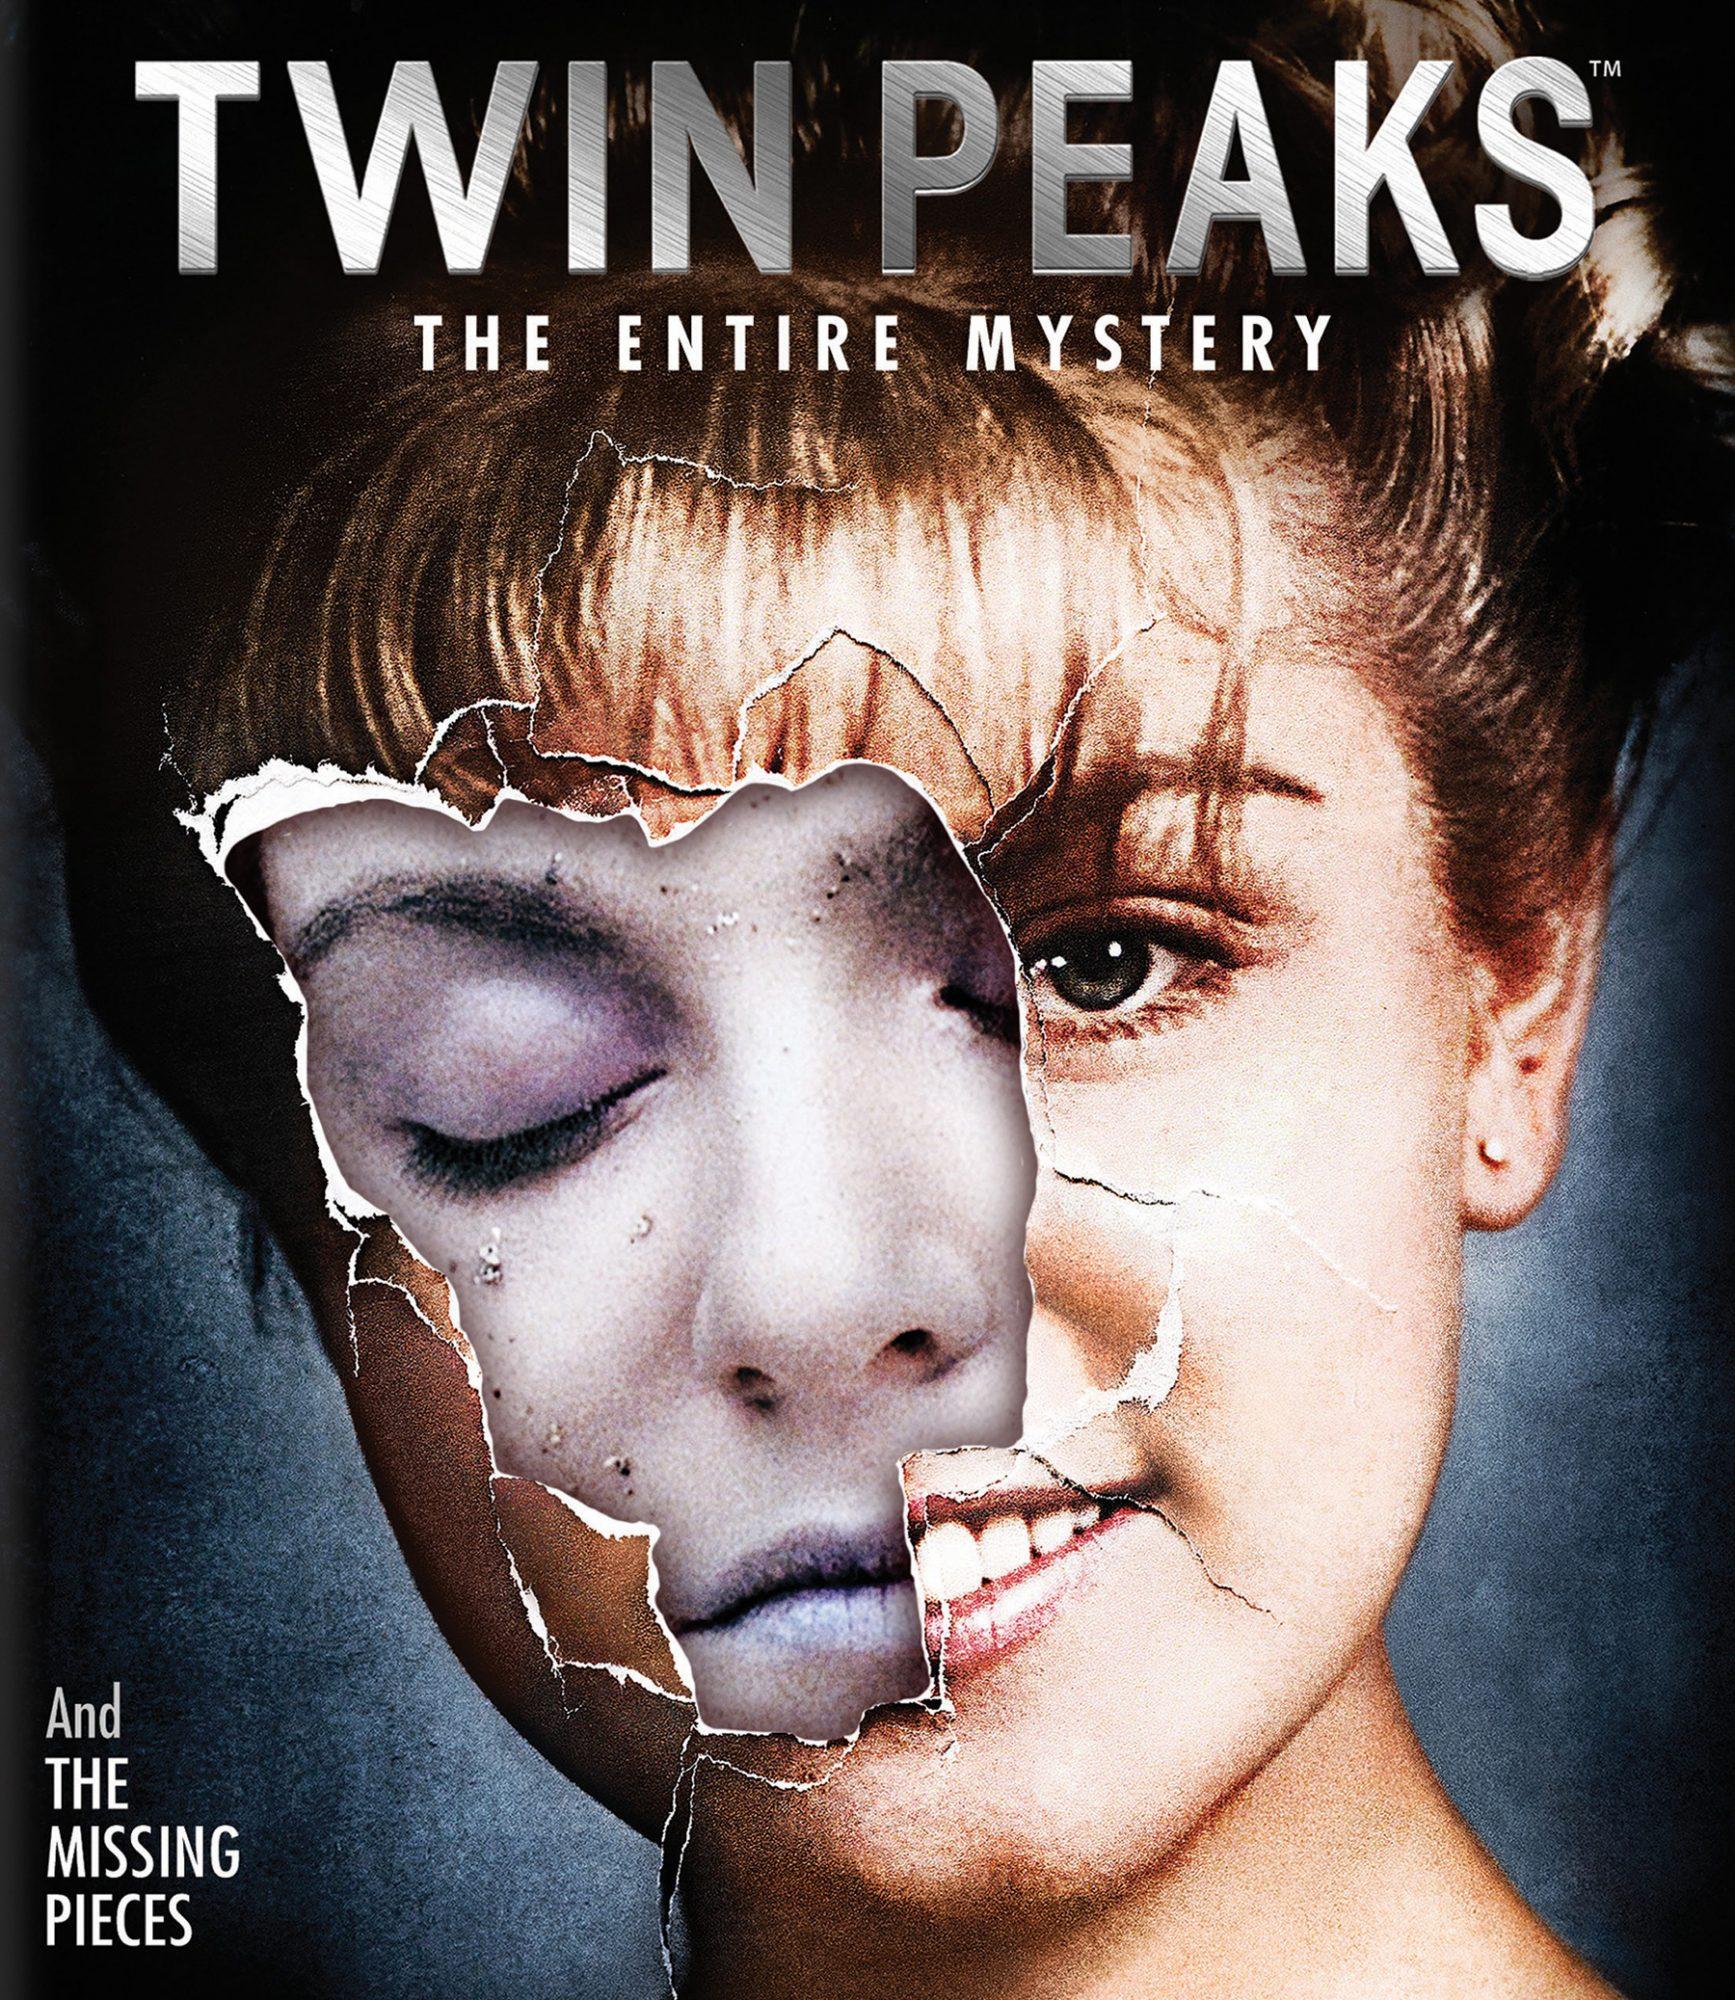 Twin Peaks bluray -- exclusive EW.com image